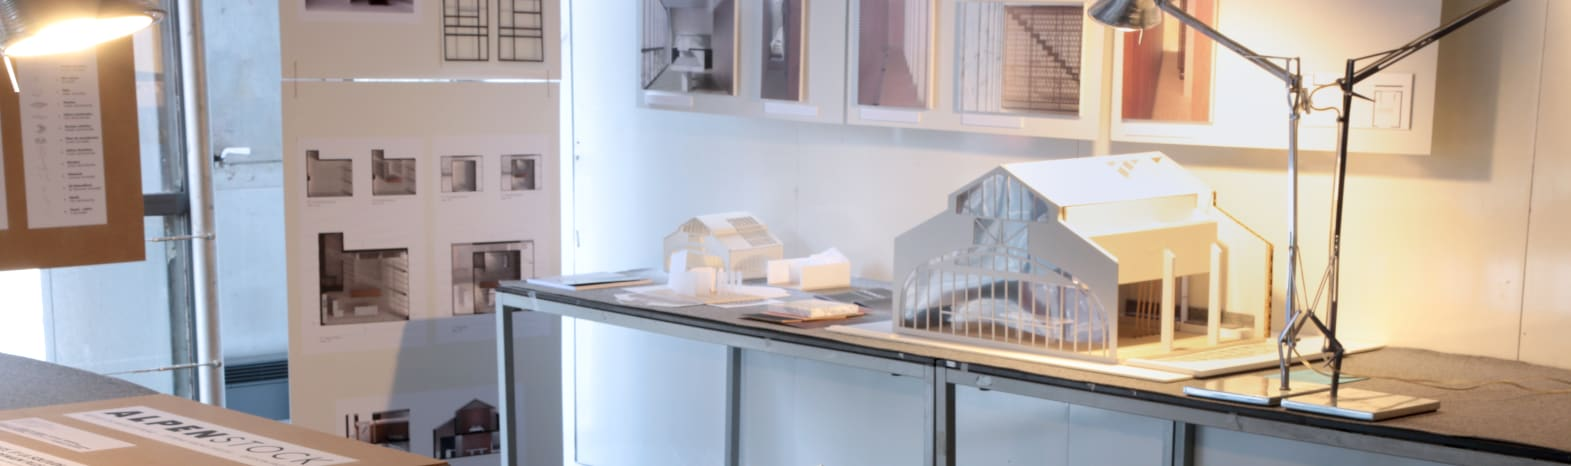 Master Of Interior Architecture Object Design Toulon France 2020